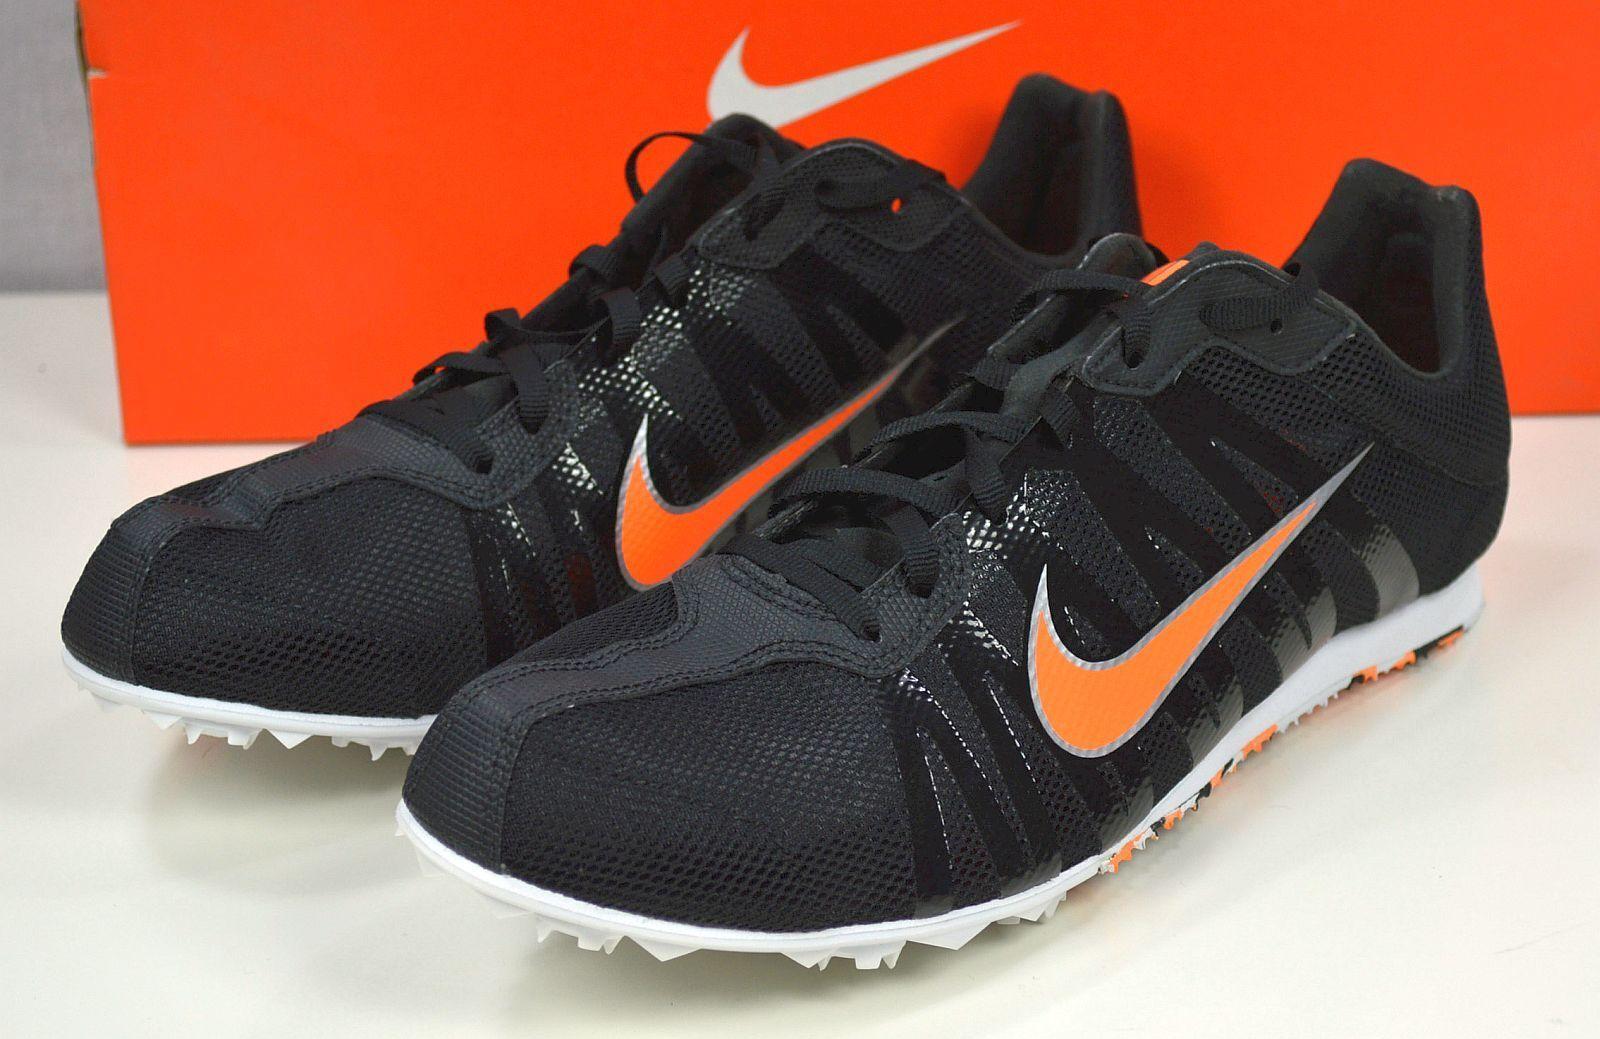 Nike Zoom Rival D V Unisex Track Spike Laufschuhe Sportschuhe sale 12041706